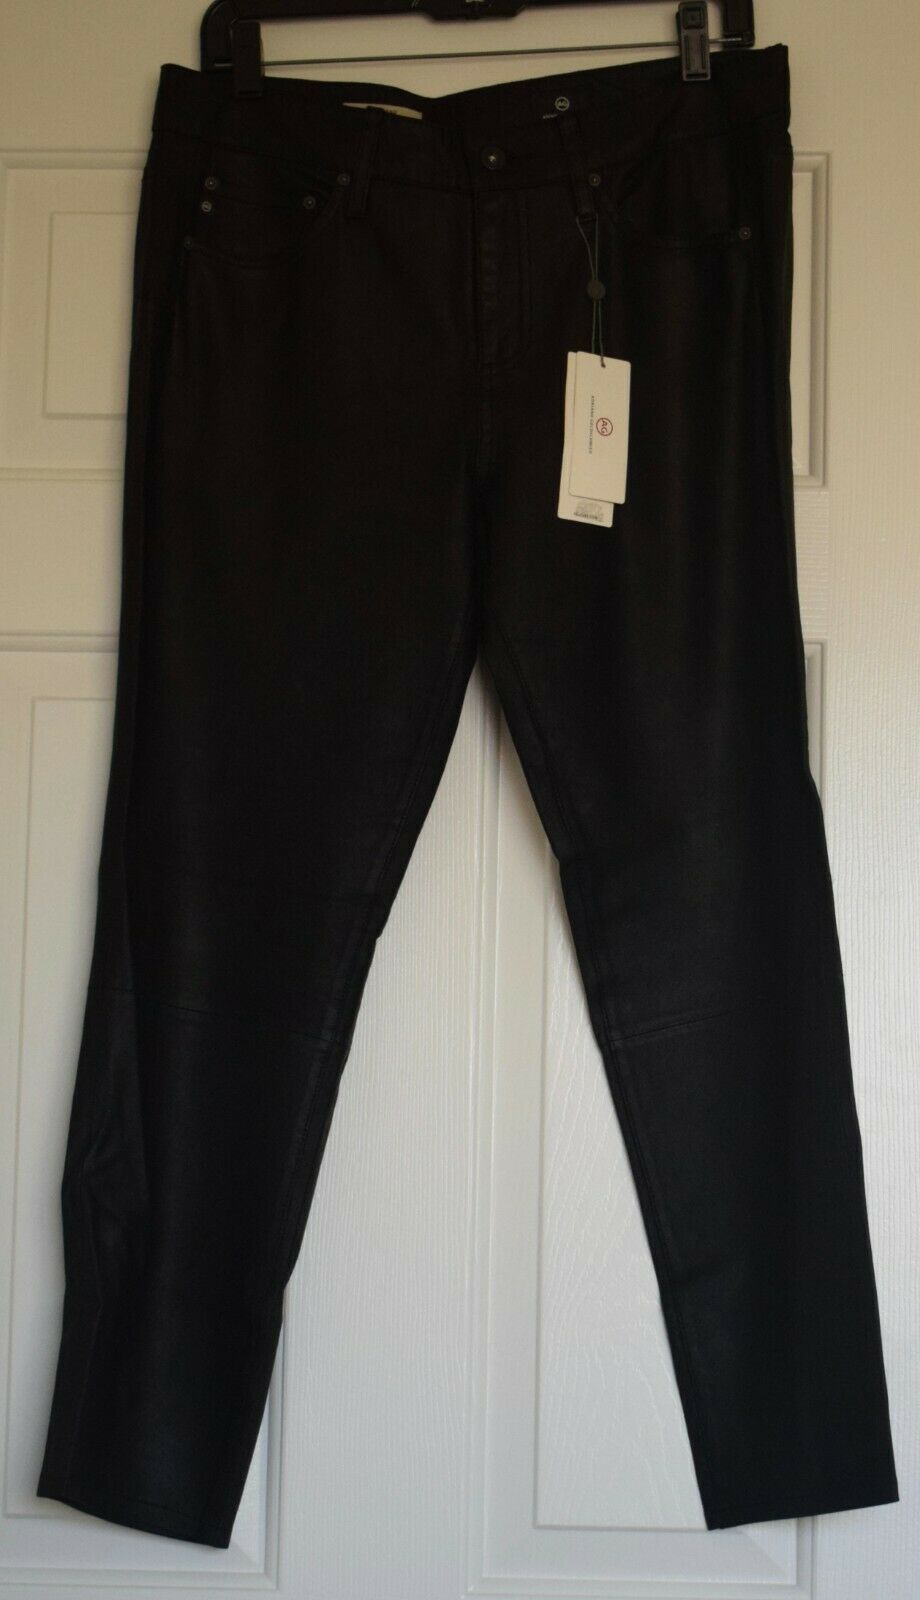 AGAdriano Goldschmied Leather Pants, Größe 28